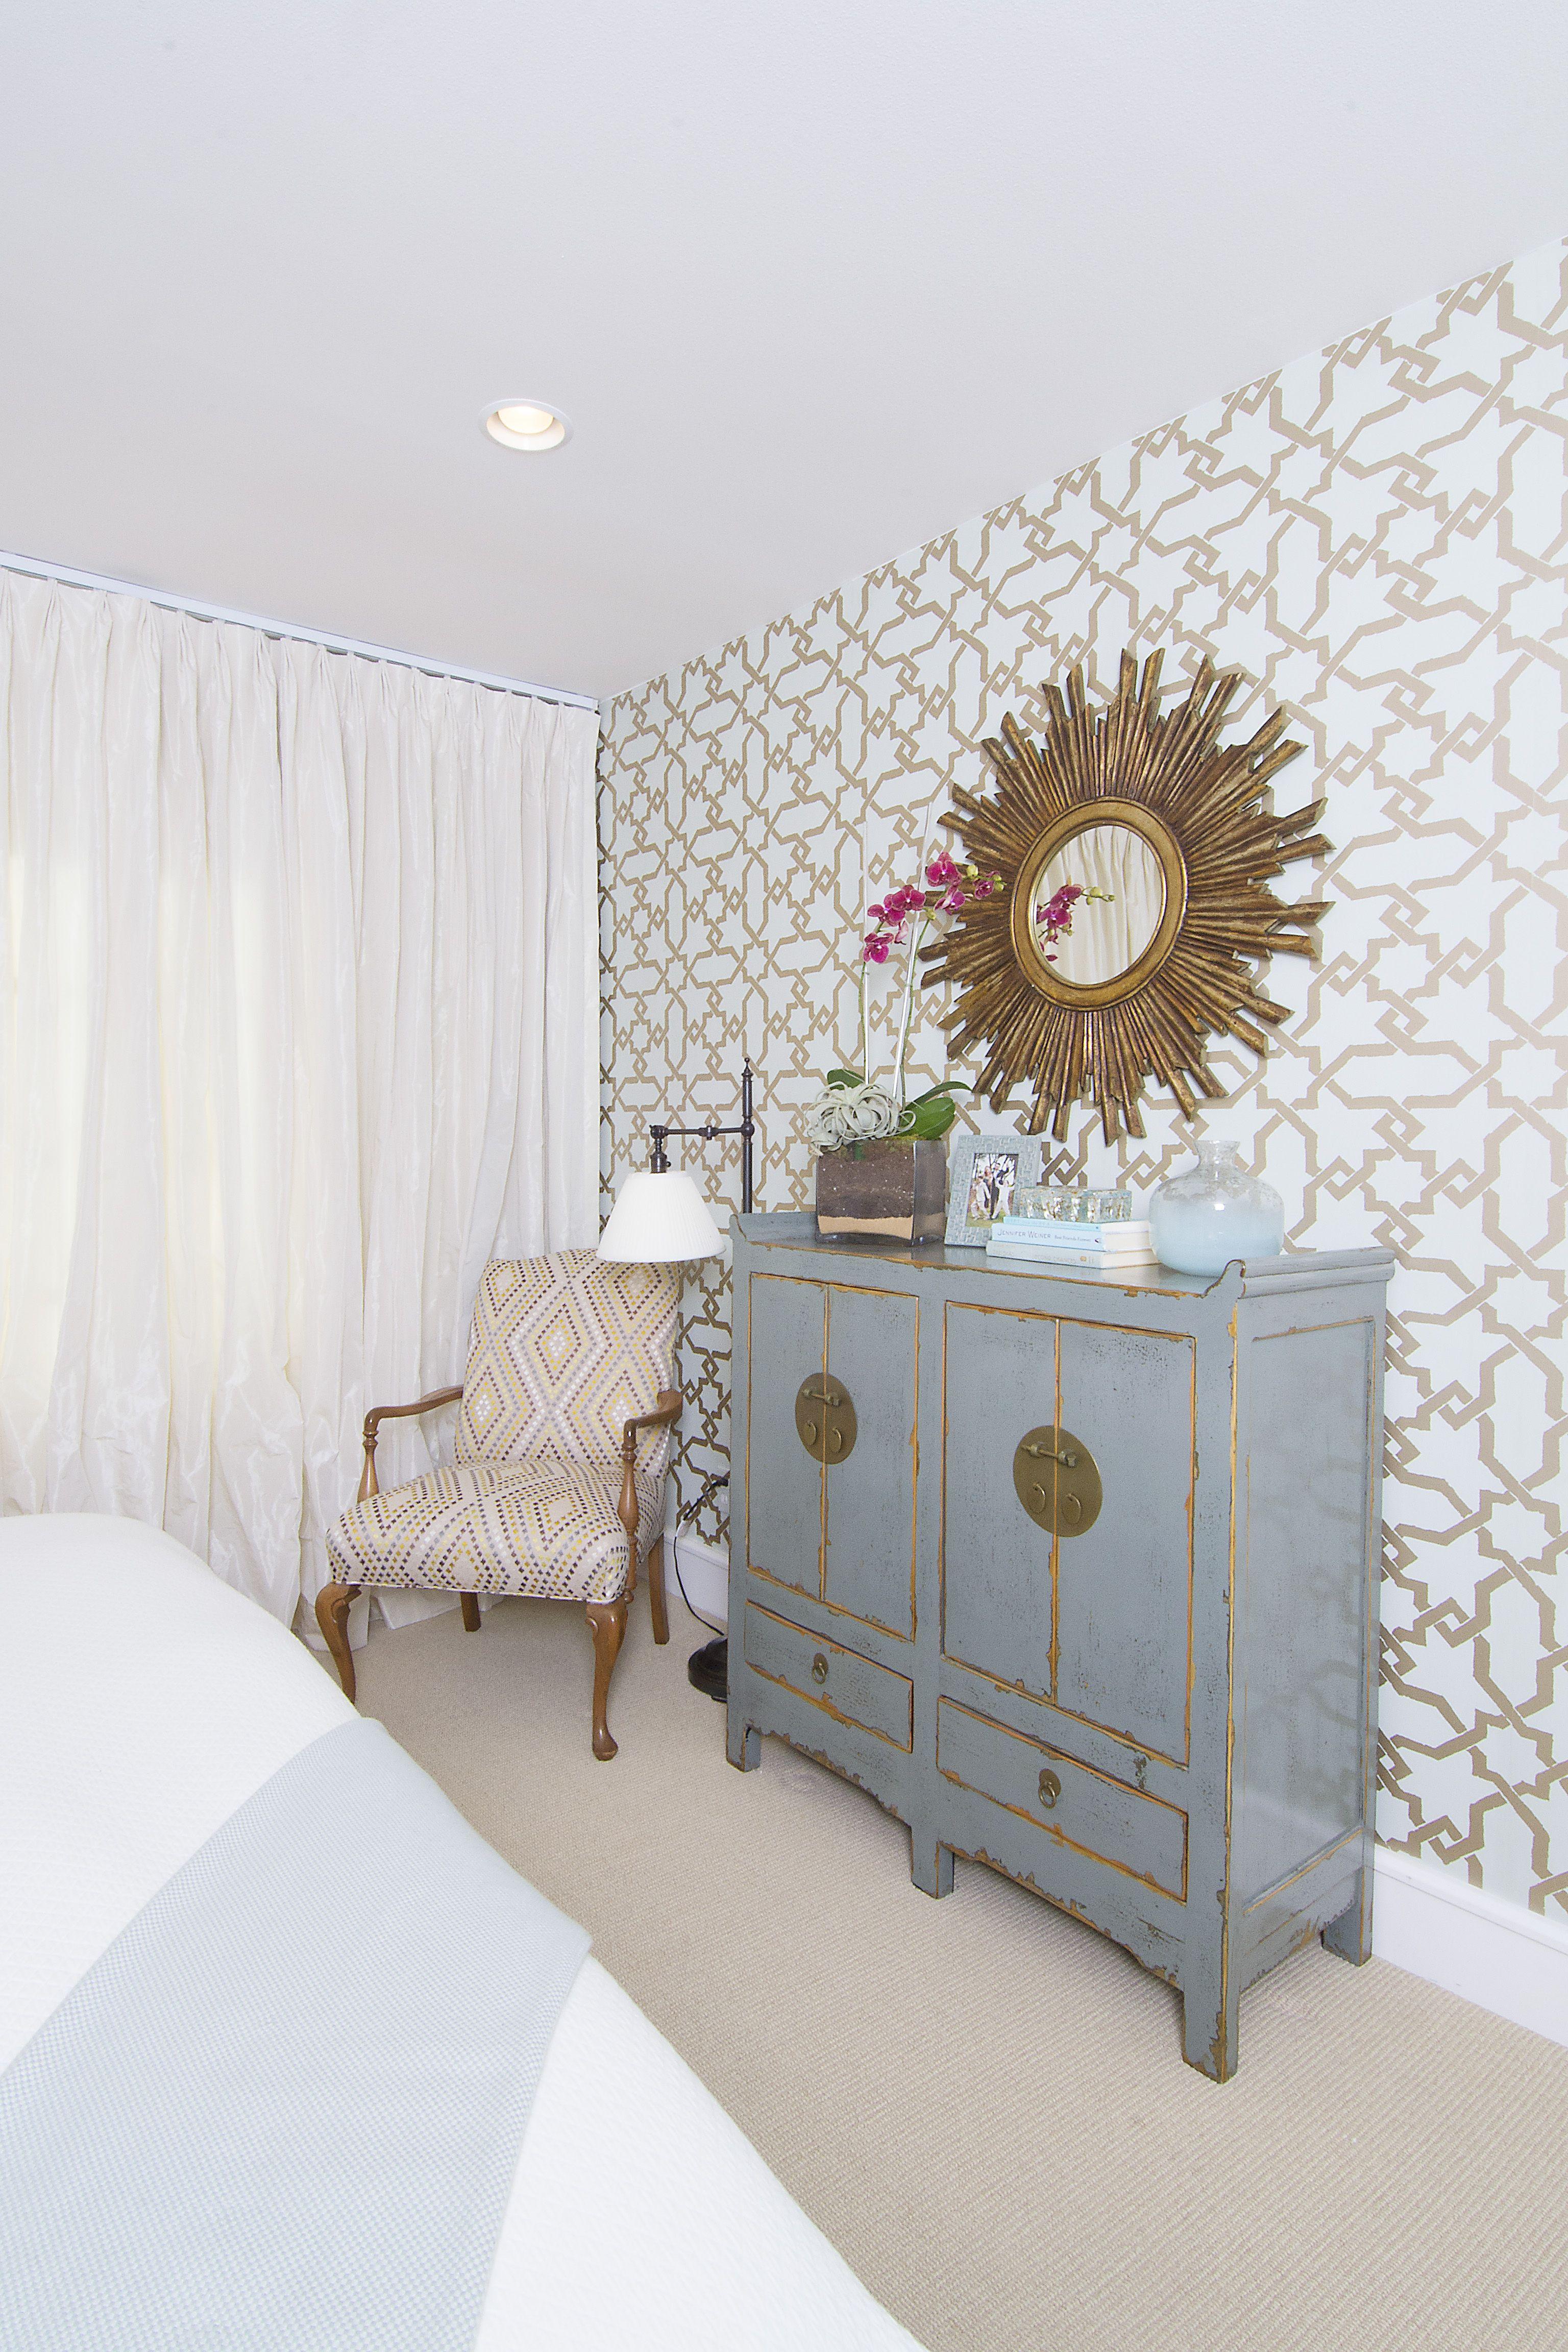 Beautiful details from Kendra's guest bedroom #KendraScott ...